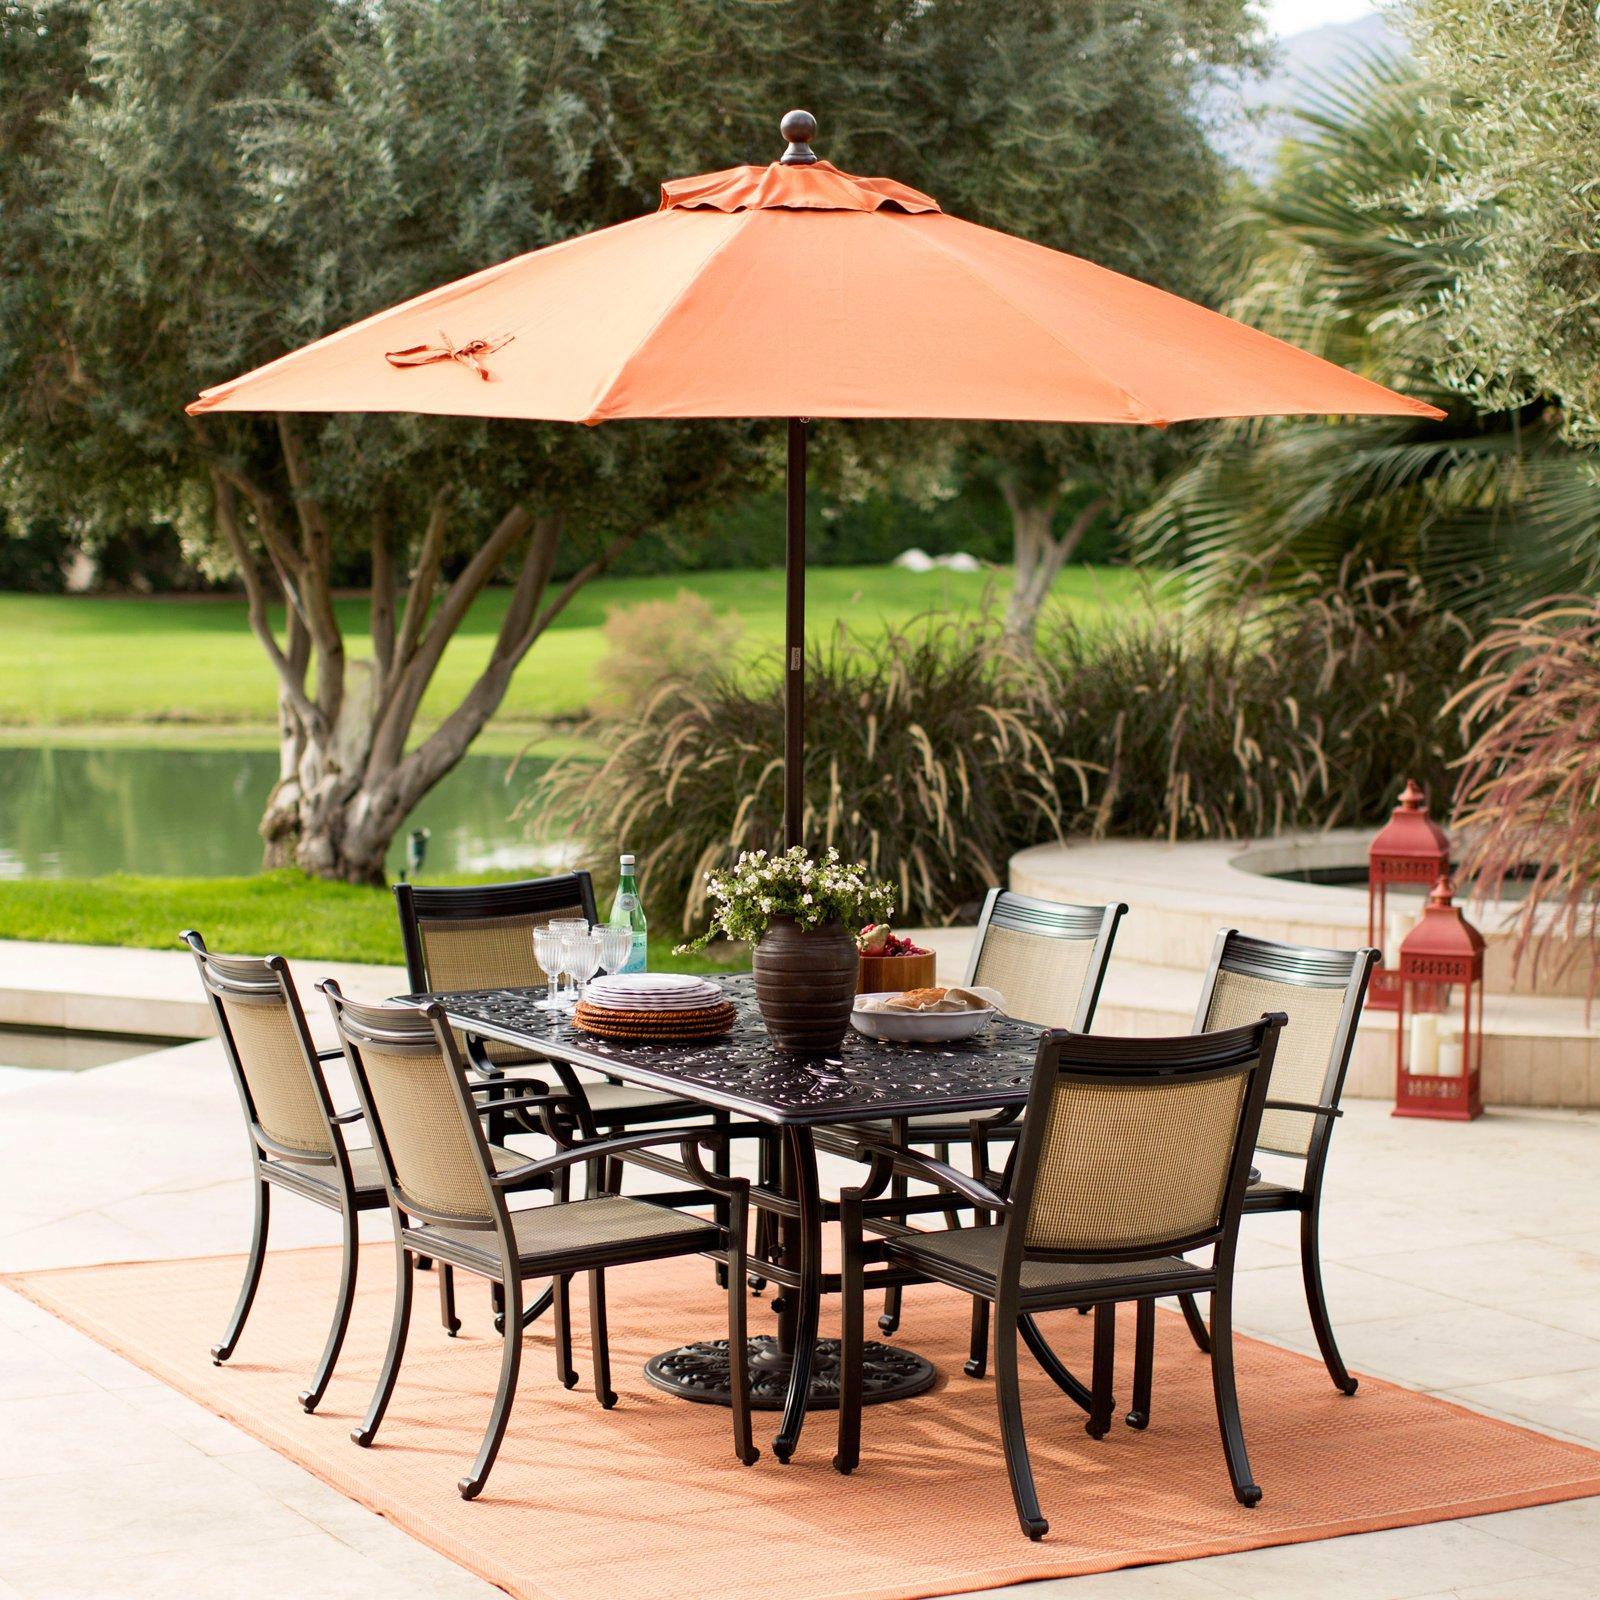 Sunbrella Commercial Grade Aluminum Wind Resistant Patio Umbrella -  Traveller Location